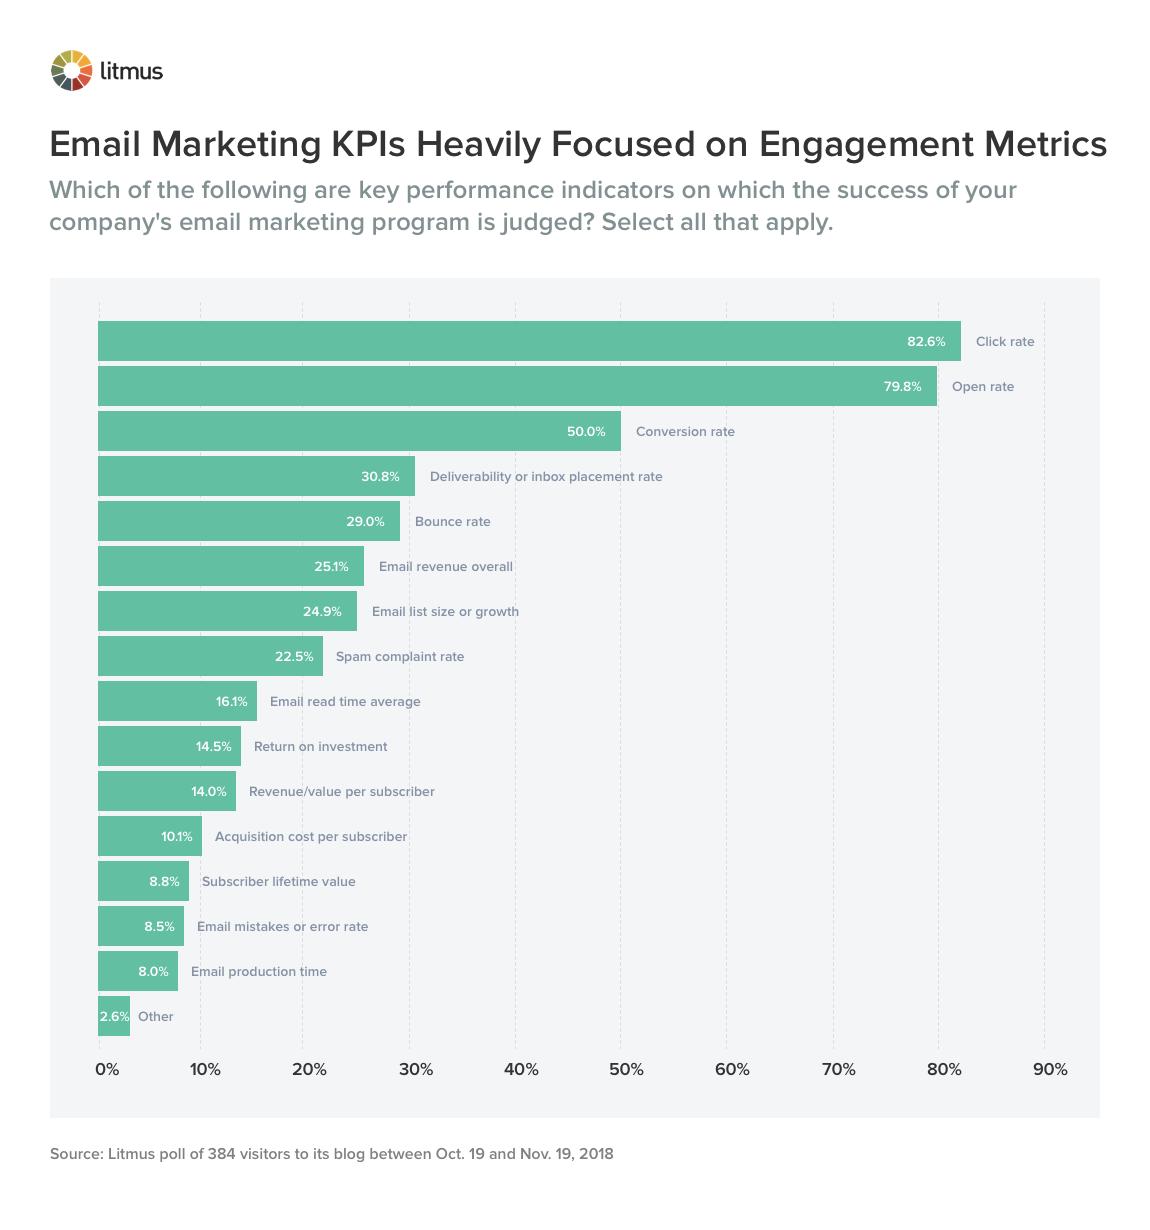 Email Marketing KPIs Heavily Focused on Engagement Metrics